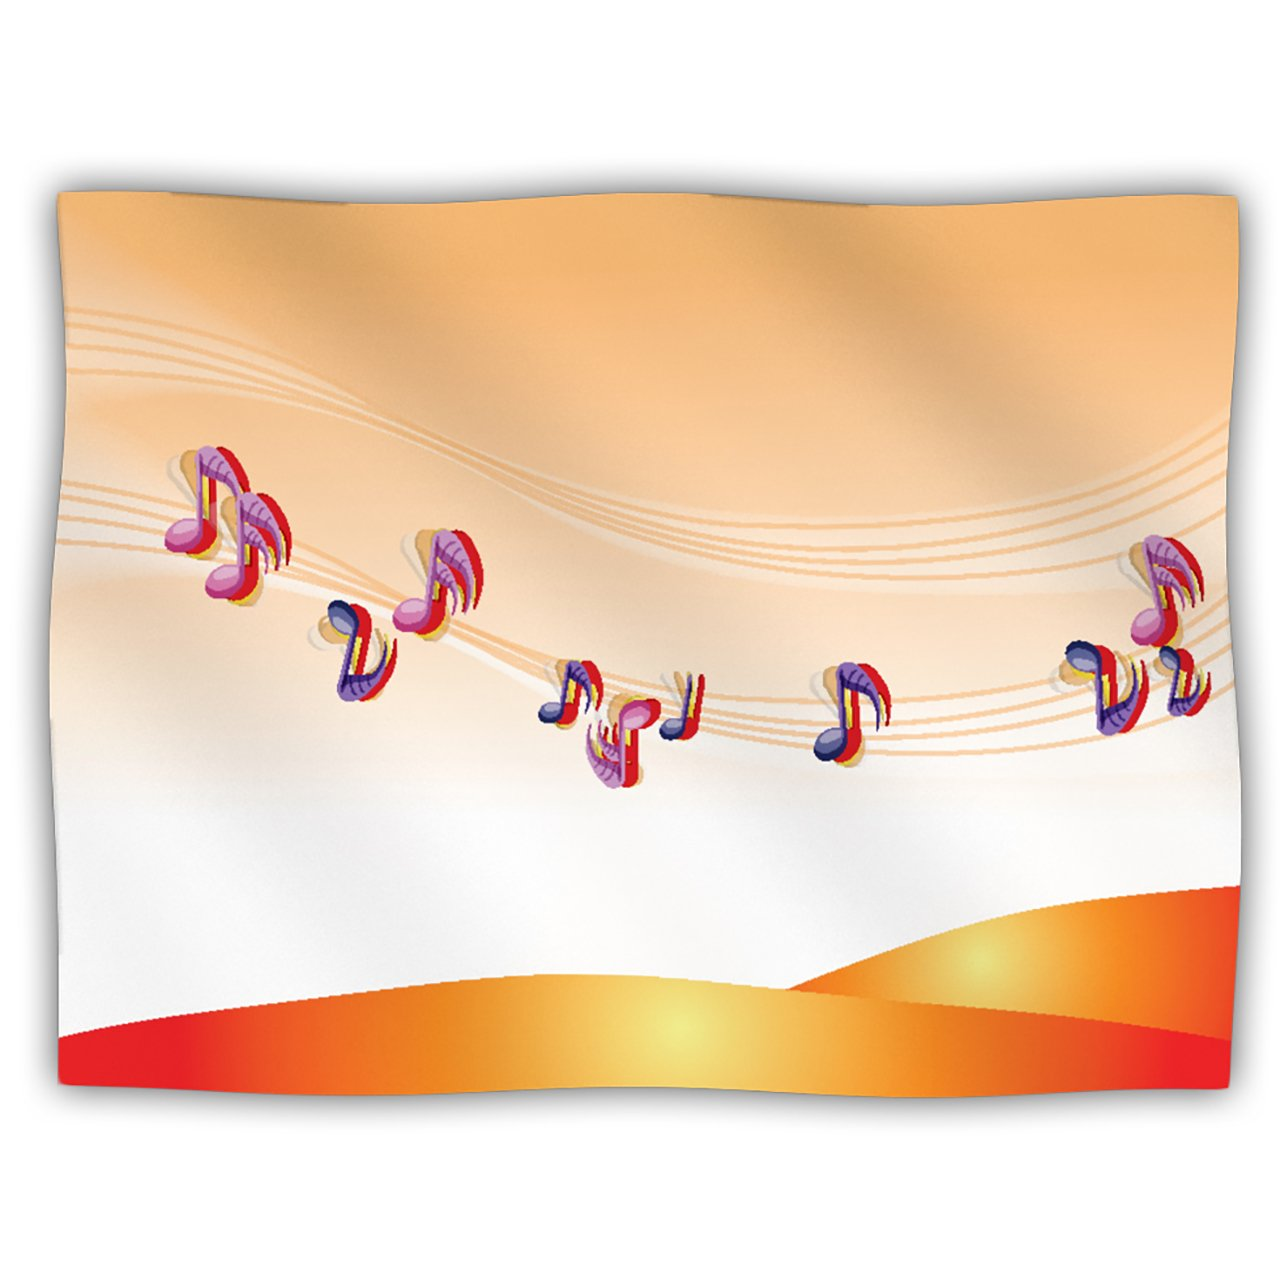 Kess InHouse Fotios Pavlopoulos Nature Music orange White Pet Blanket, 40 by 30-Inch